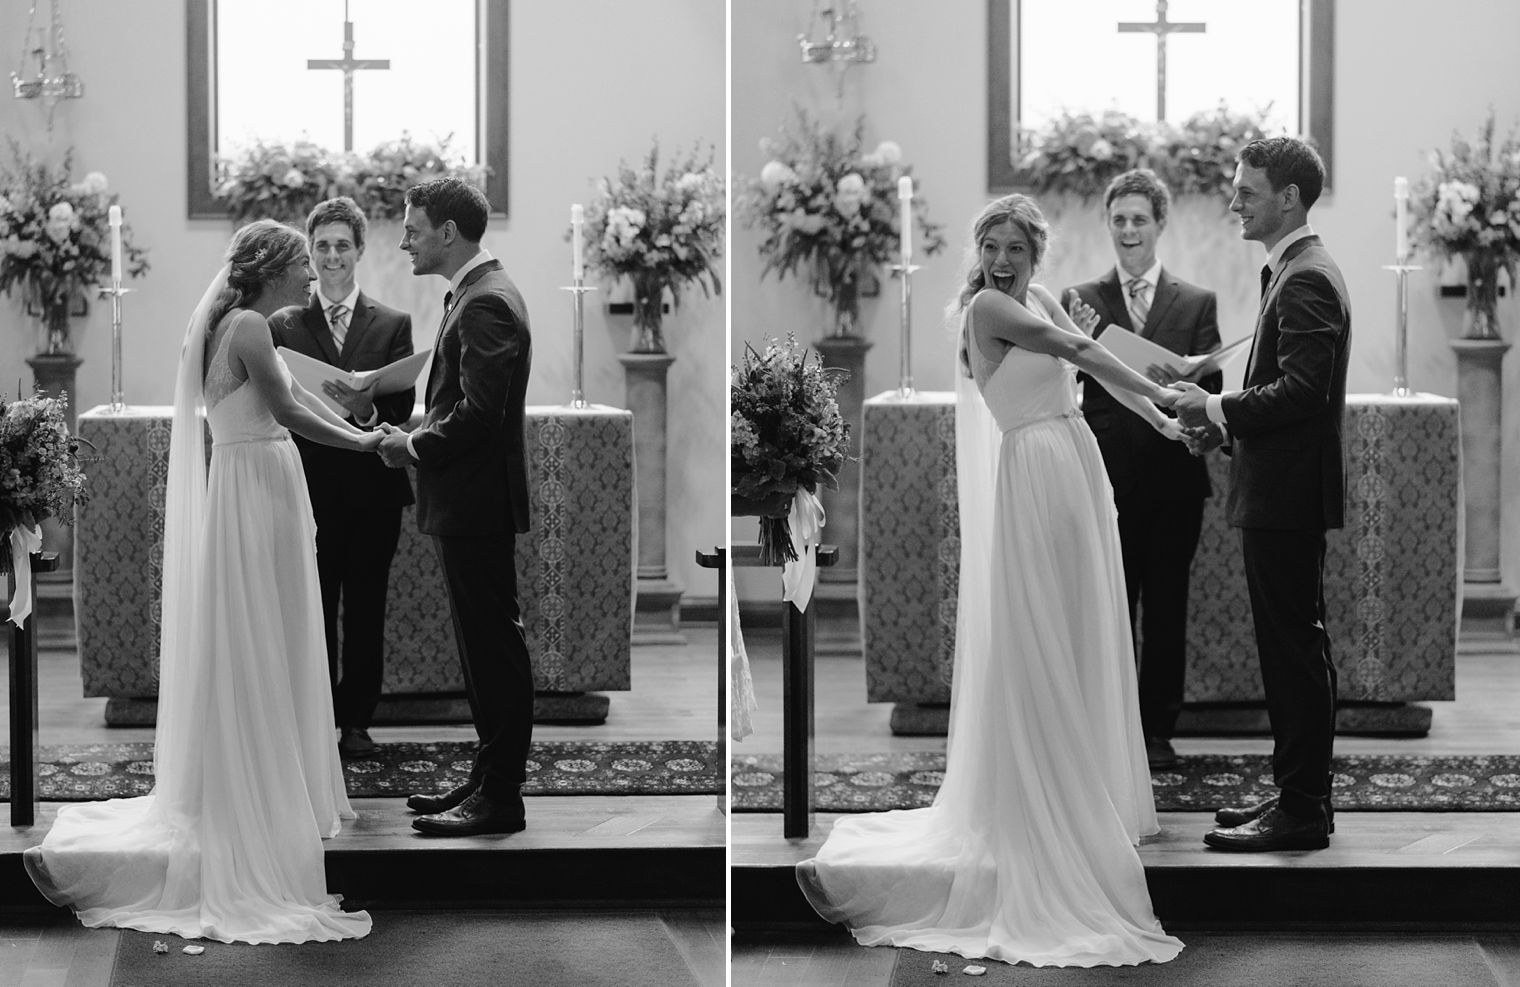 st mary church wedding ceremony in dousman